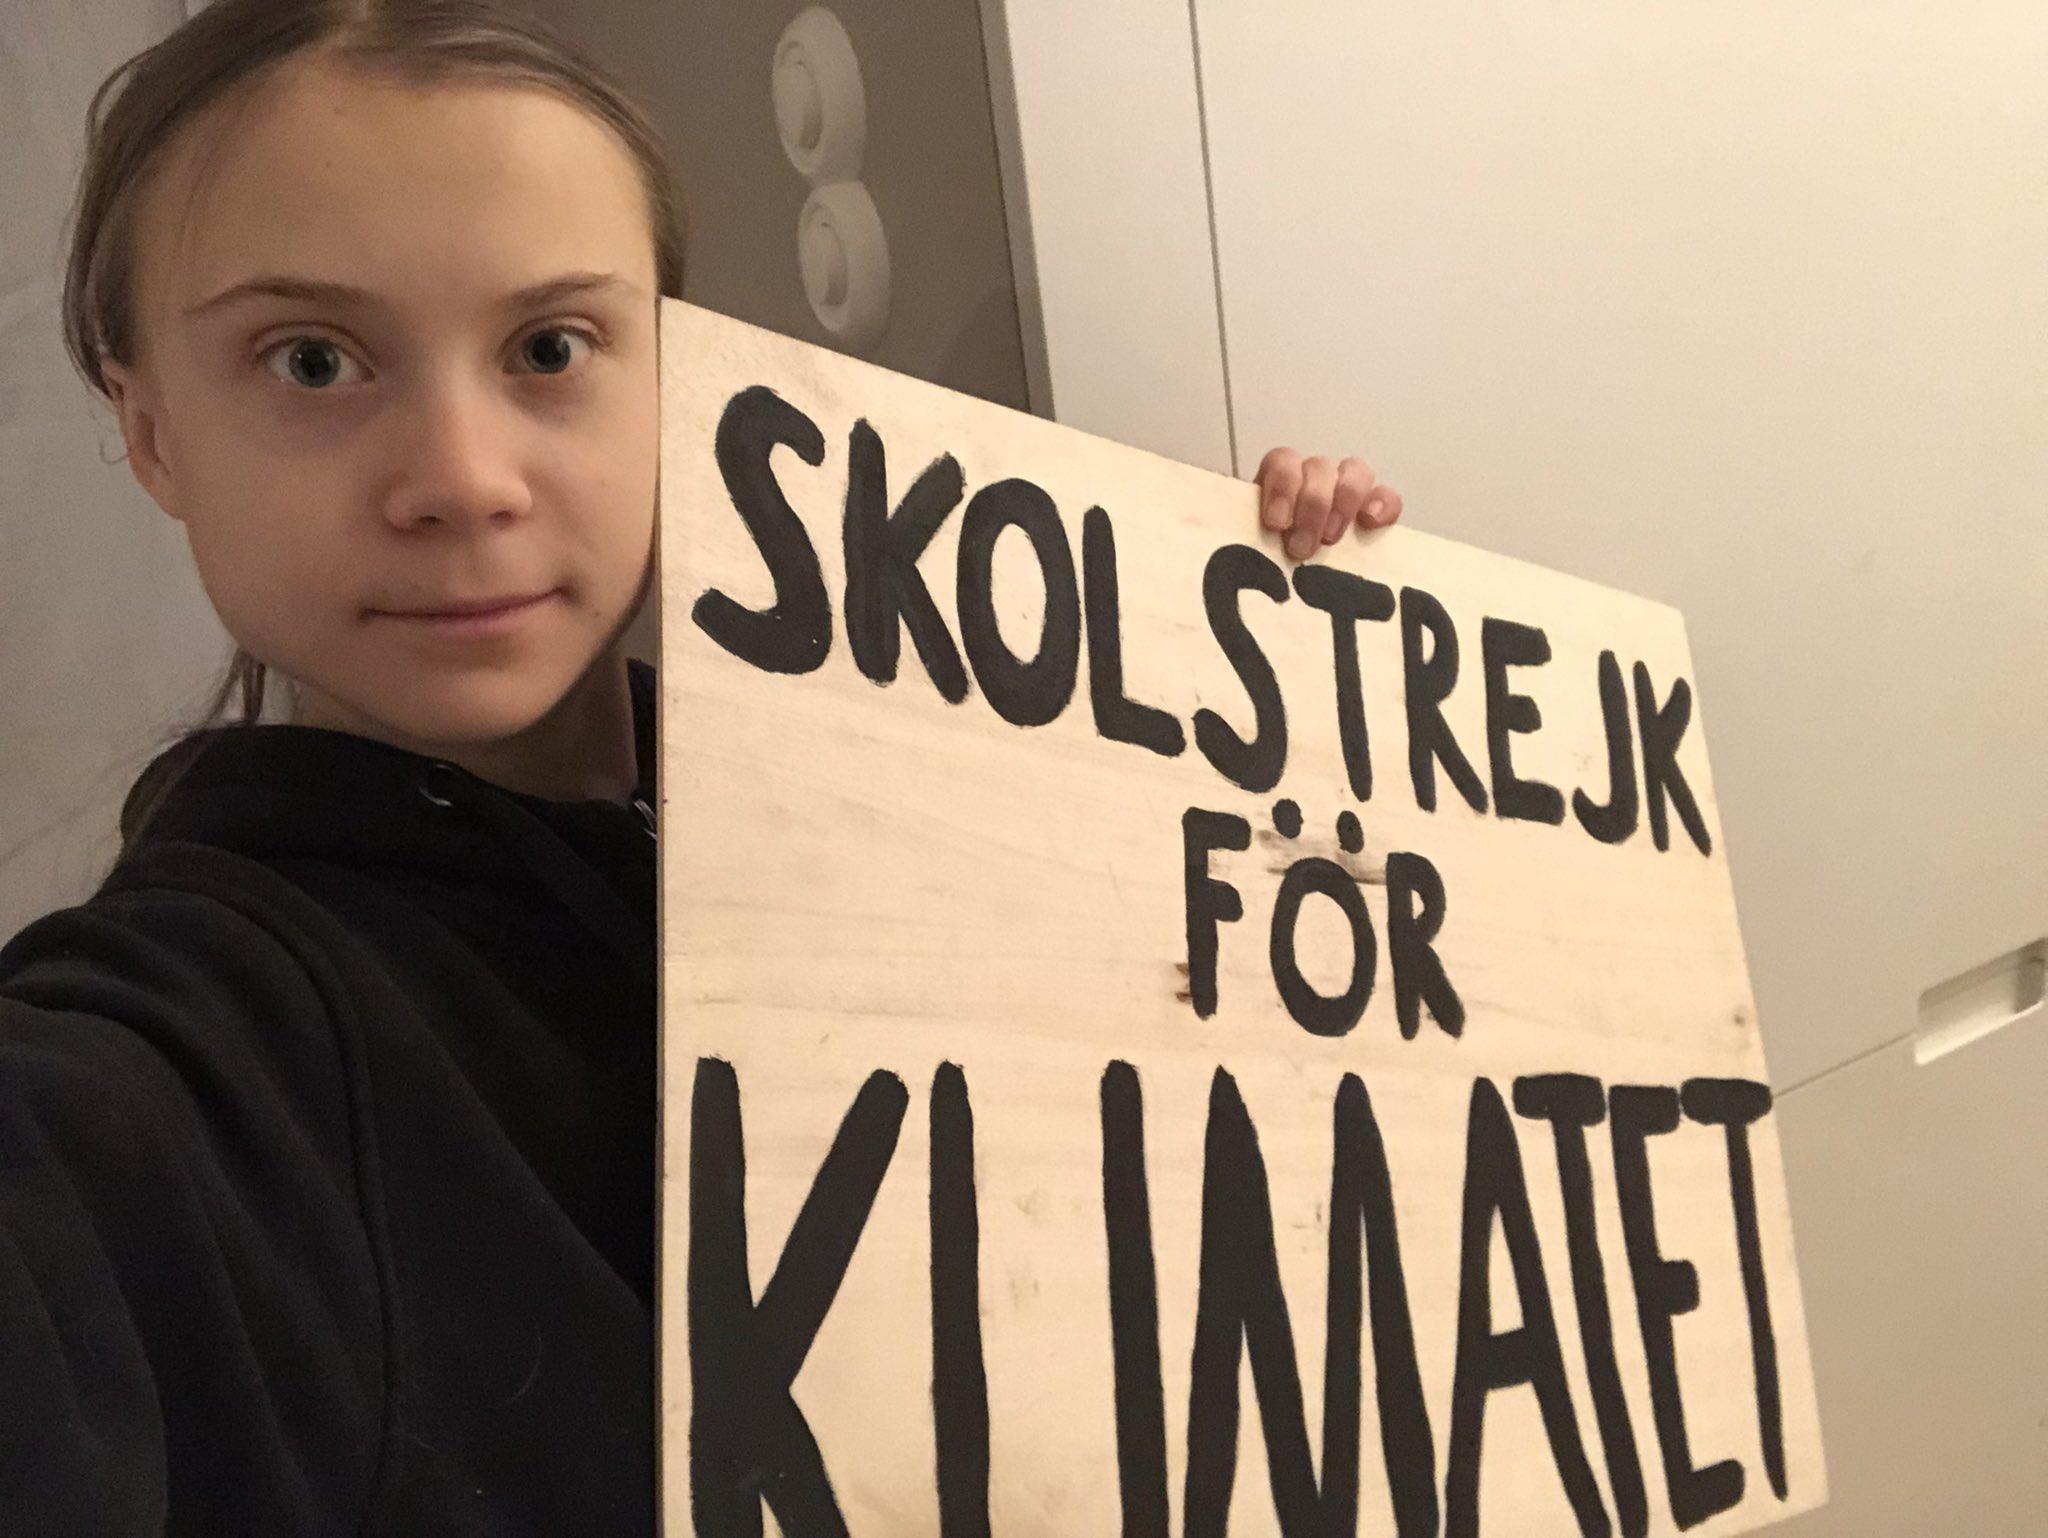 Greta Thunberg female role models